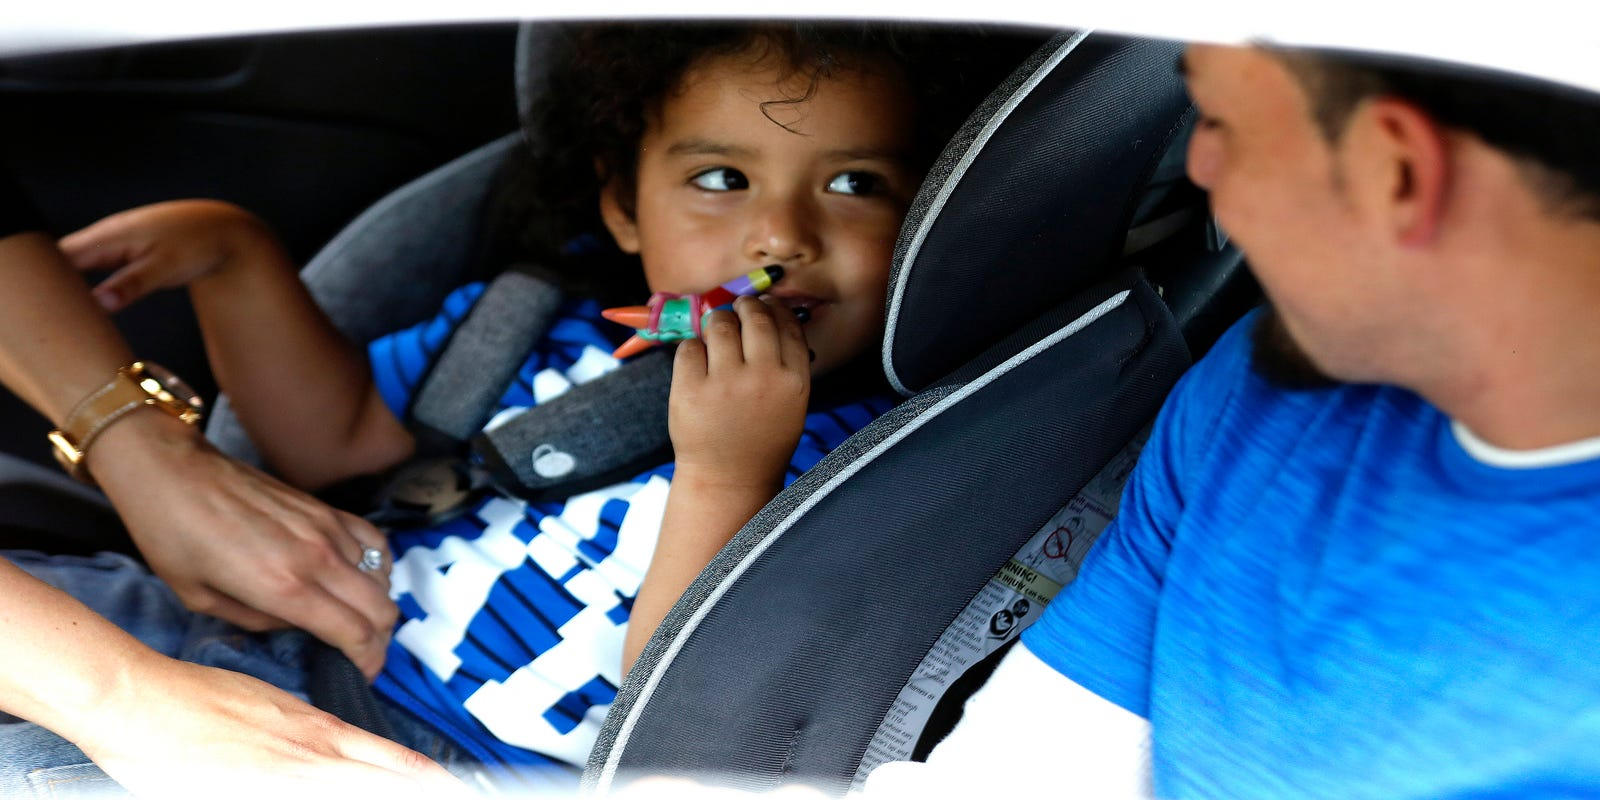 Car Seats Where Should Your Kids Sit